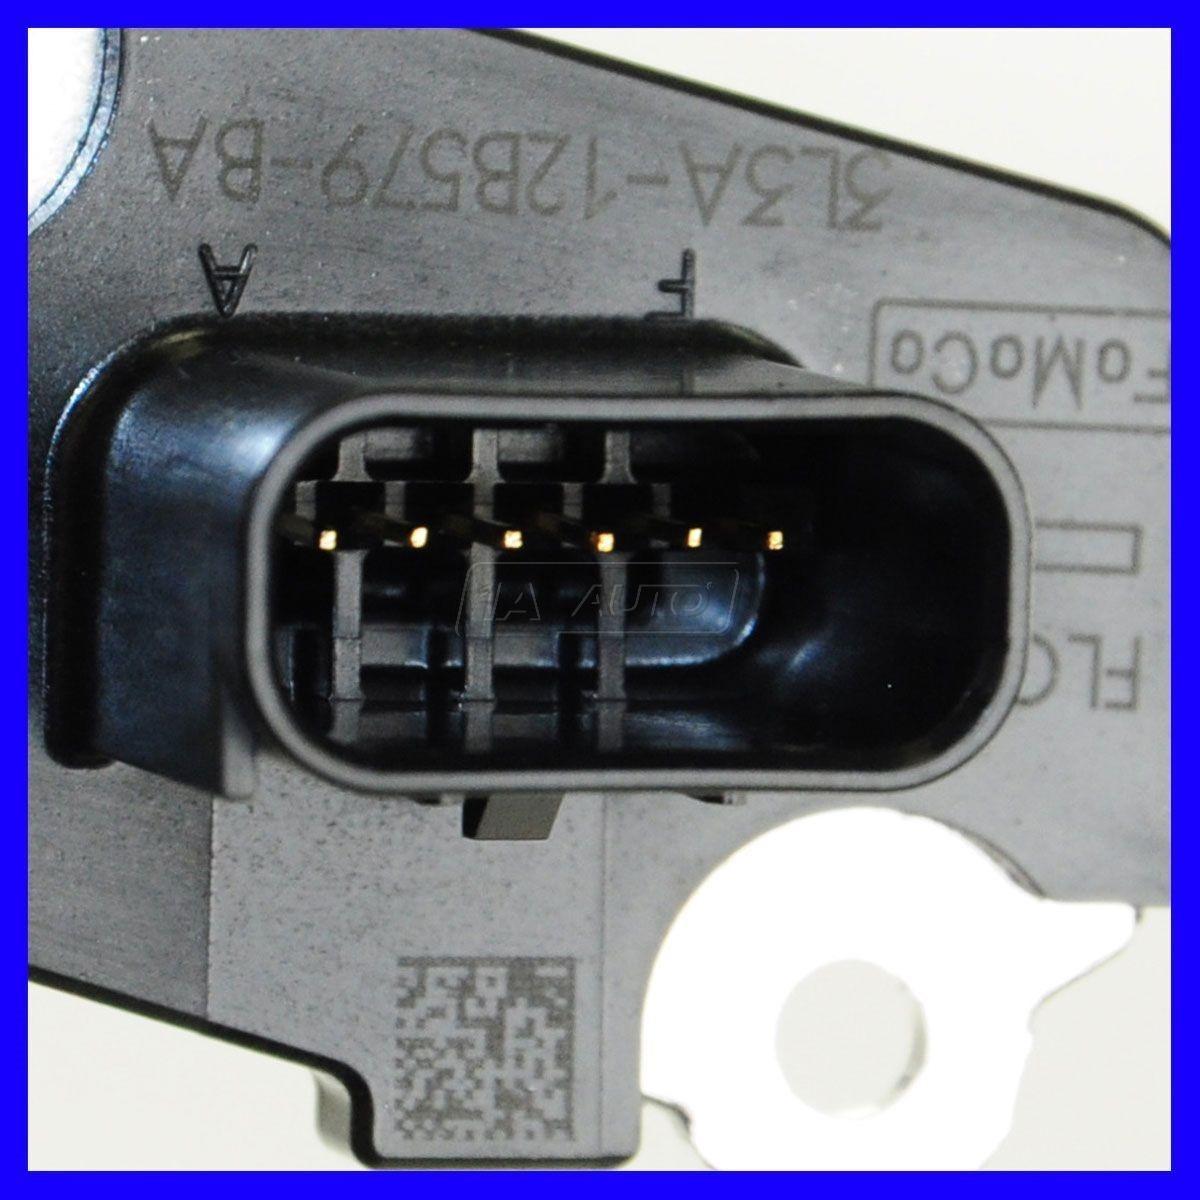 Sensor Maf Ford Focus Fusionf F Exploreredgemazda D Nq Np Mlm F on 2005 Ford Explorer Maf Sensor